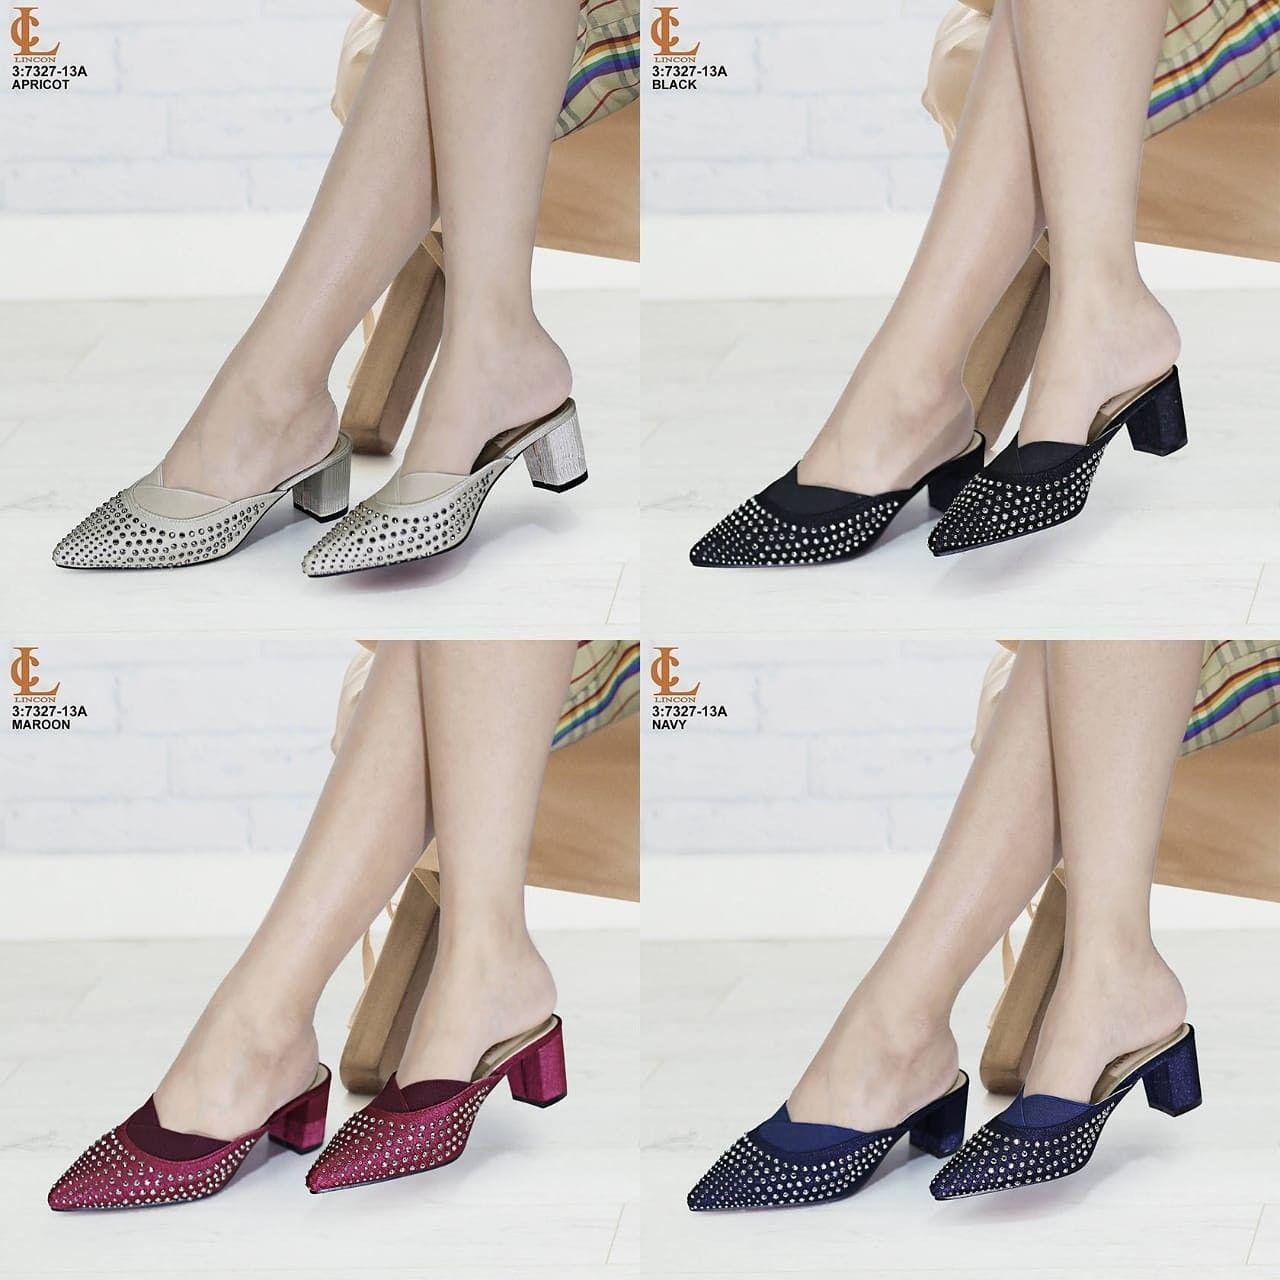 Sepatu Slop Lincon Seri 7327 13a Kualitas Original Brand Bahan